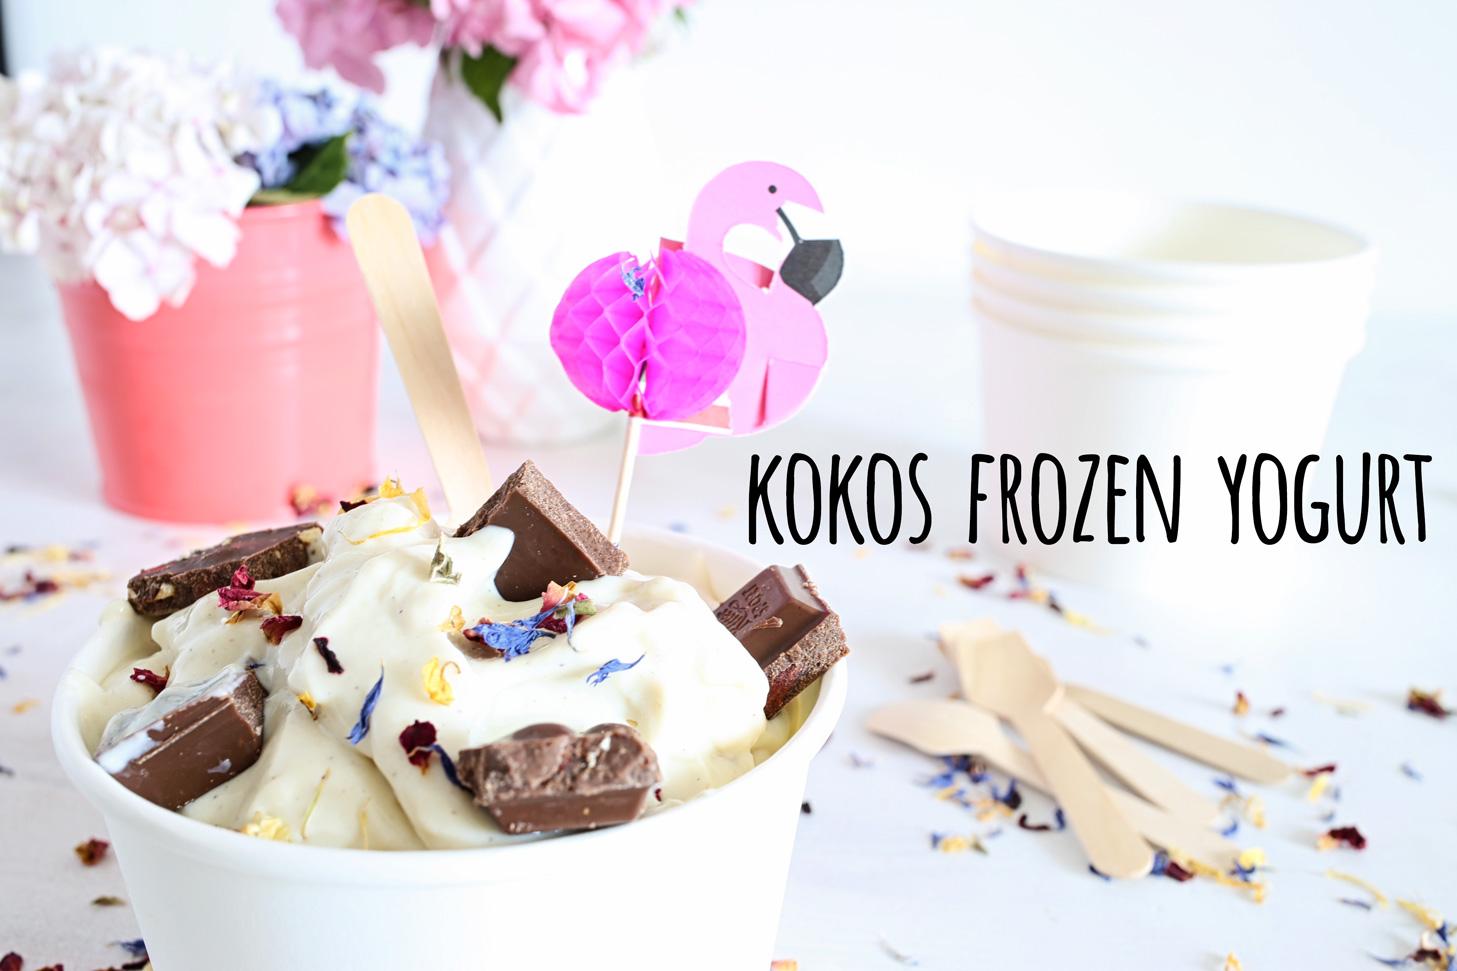 Kokos Frozen Yogurt